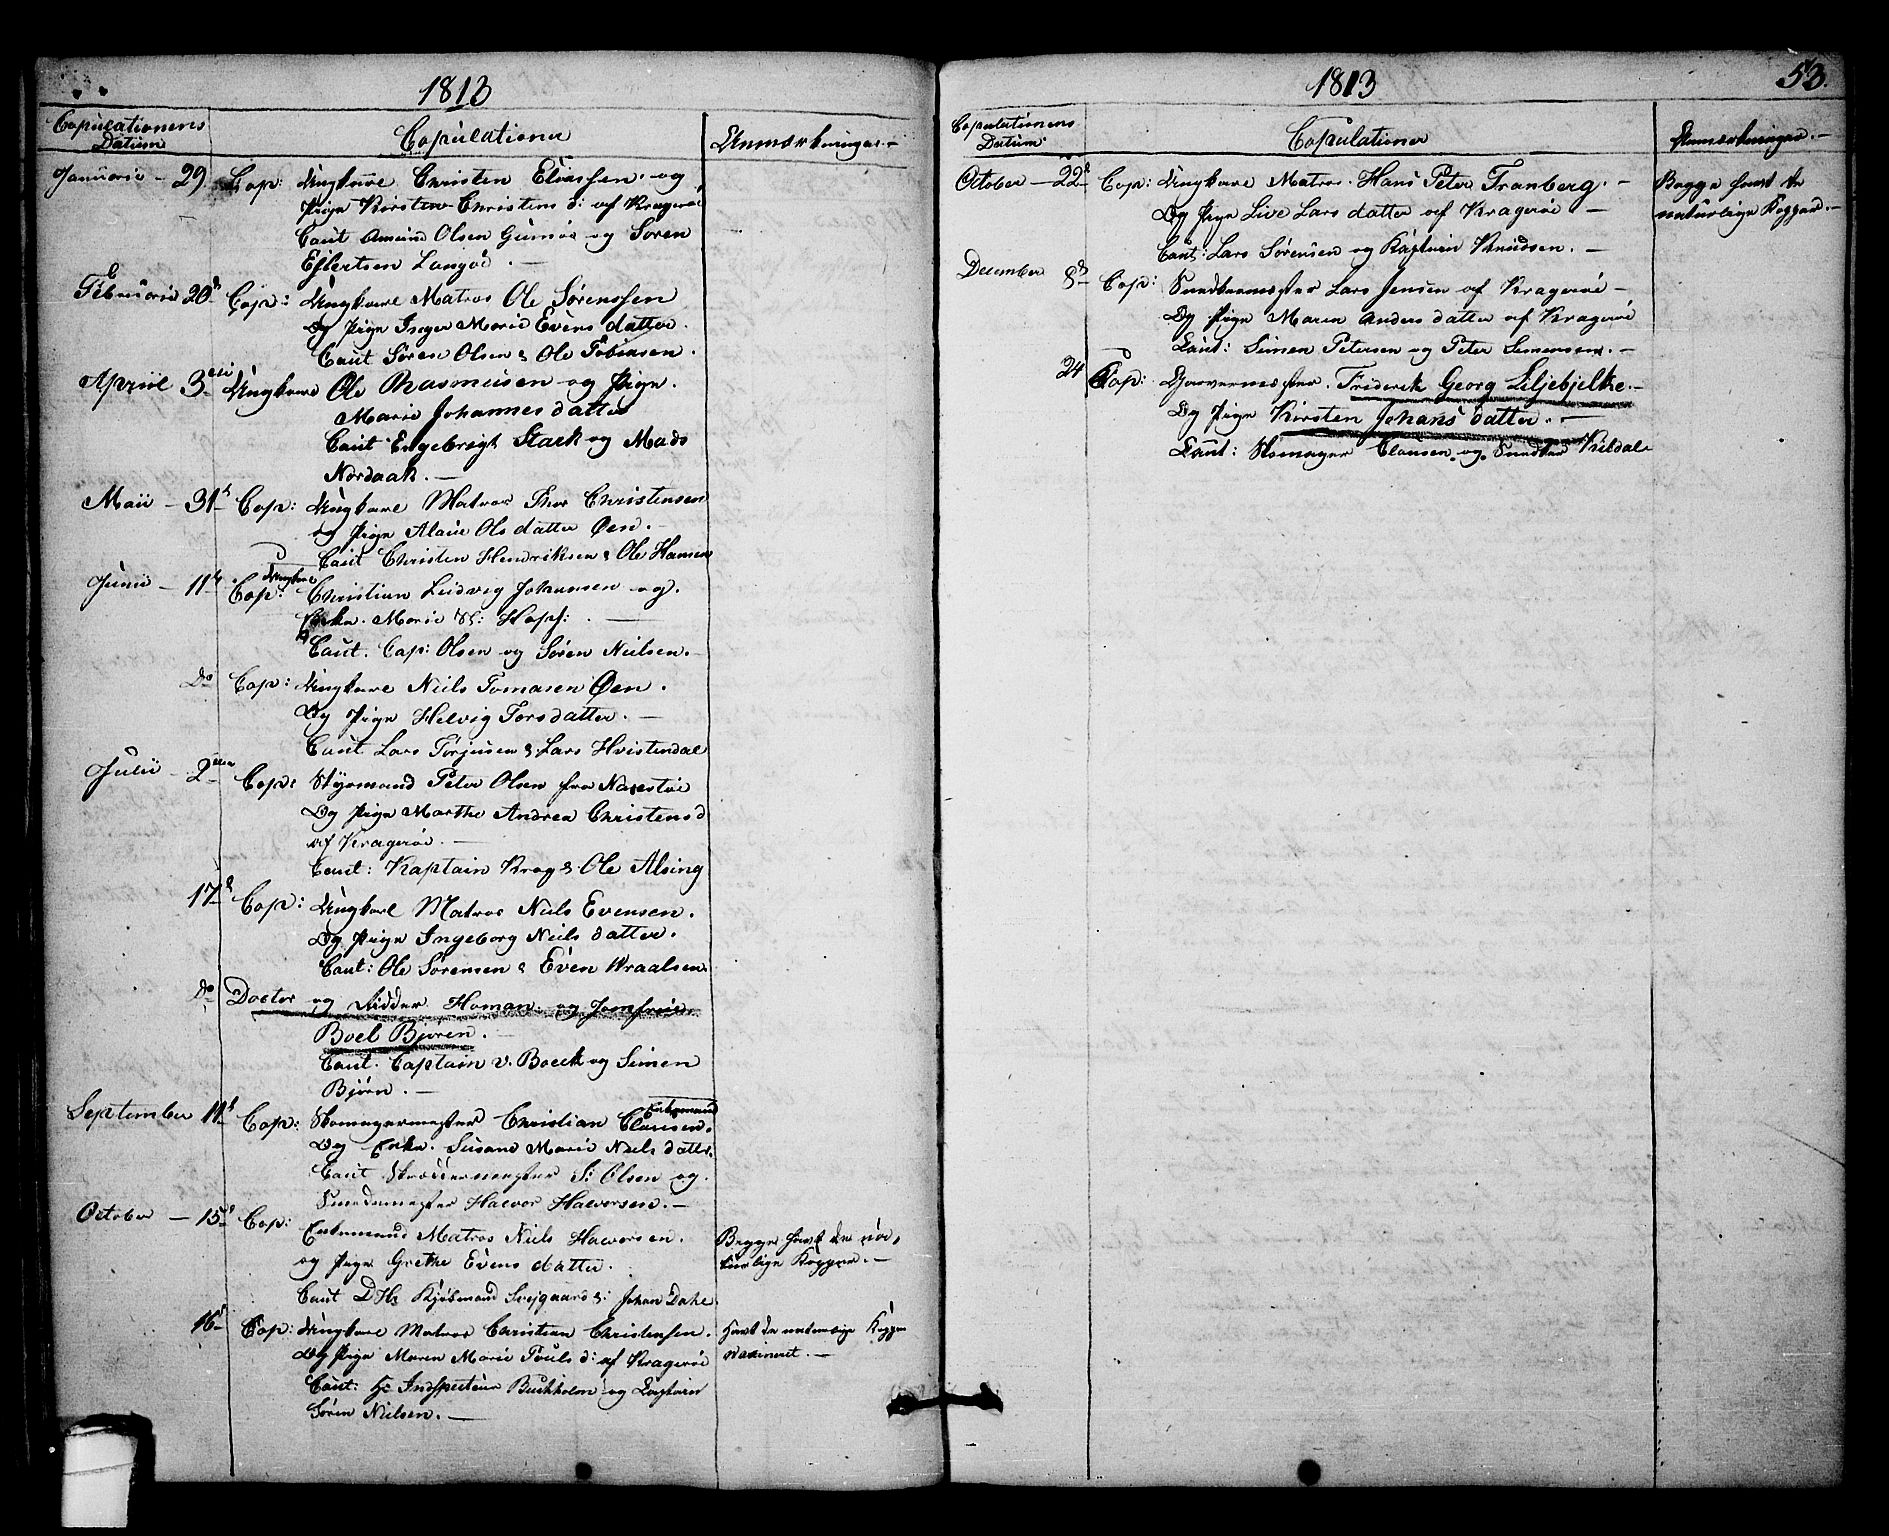 SAKO, Kragerø kirkebøker, F/Fa/L0003: Ministerialbok nr. 3, 1802-1813, s. 53